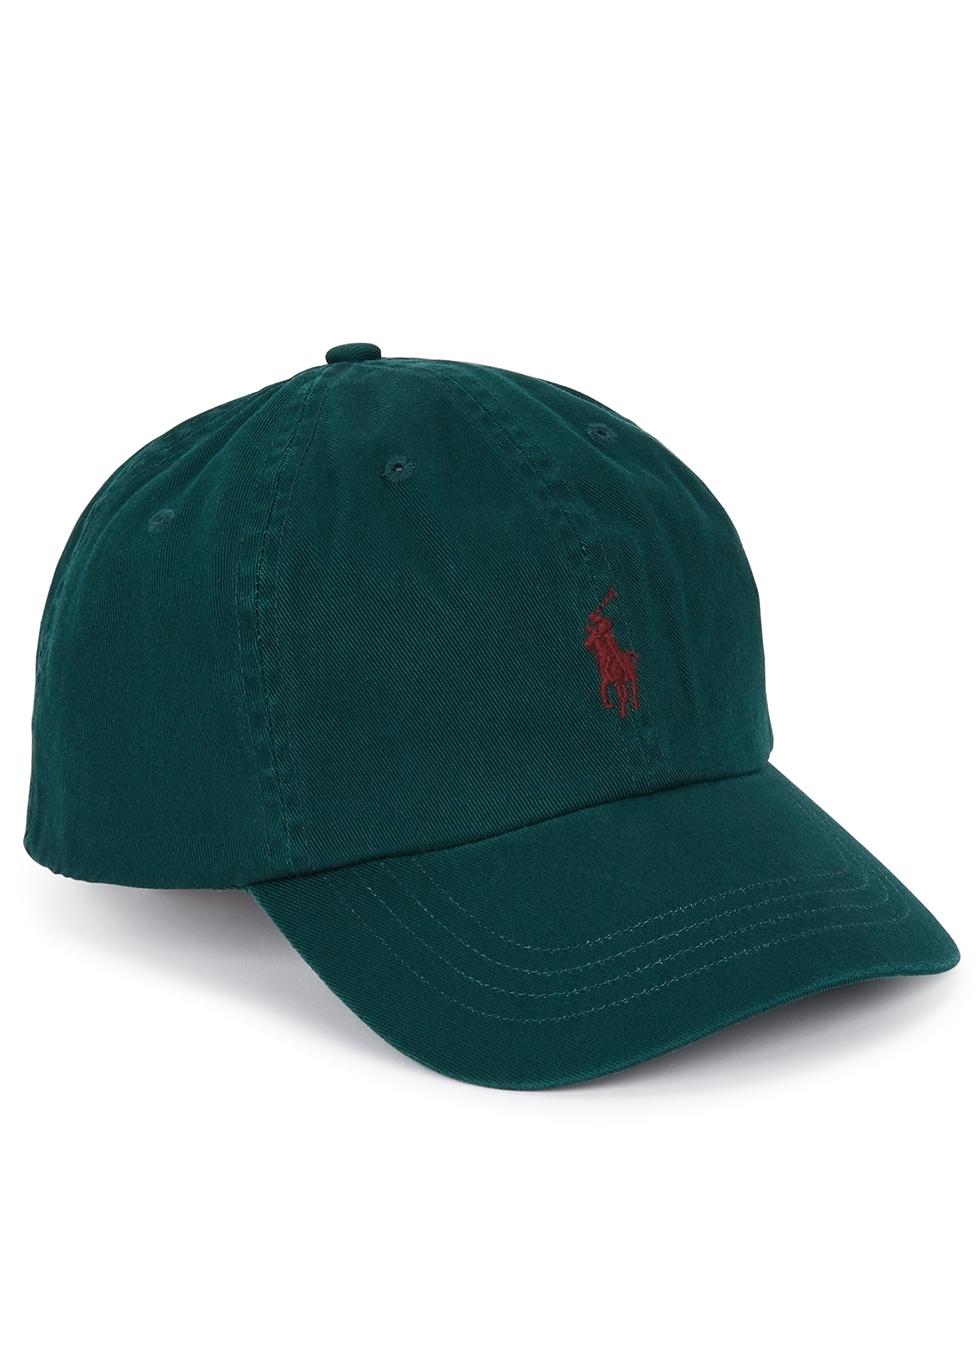 38802c739 Men's Designer Hats - Harvey Nichols